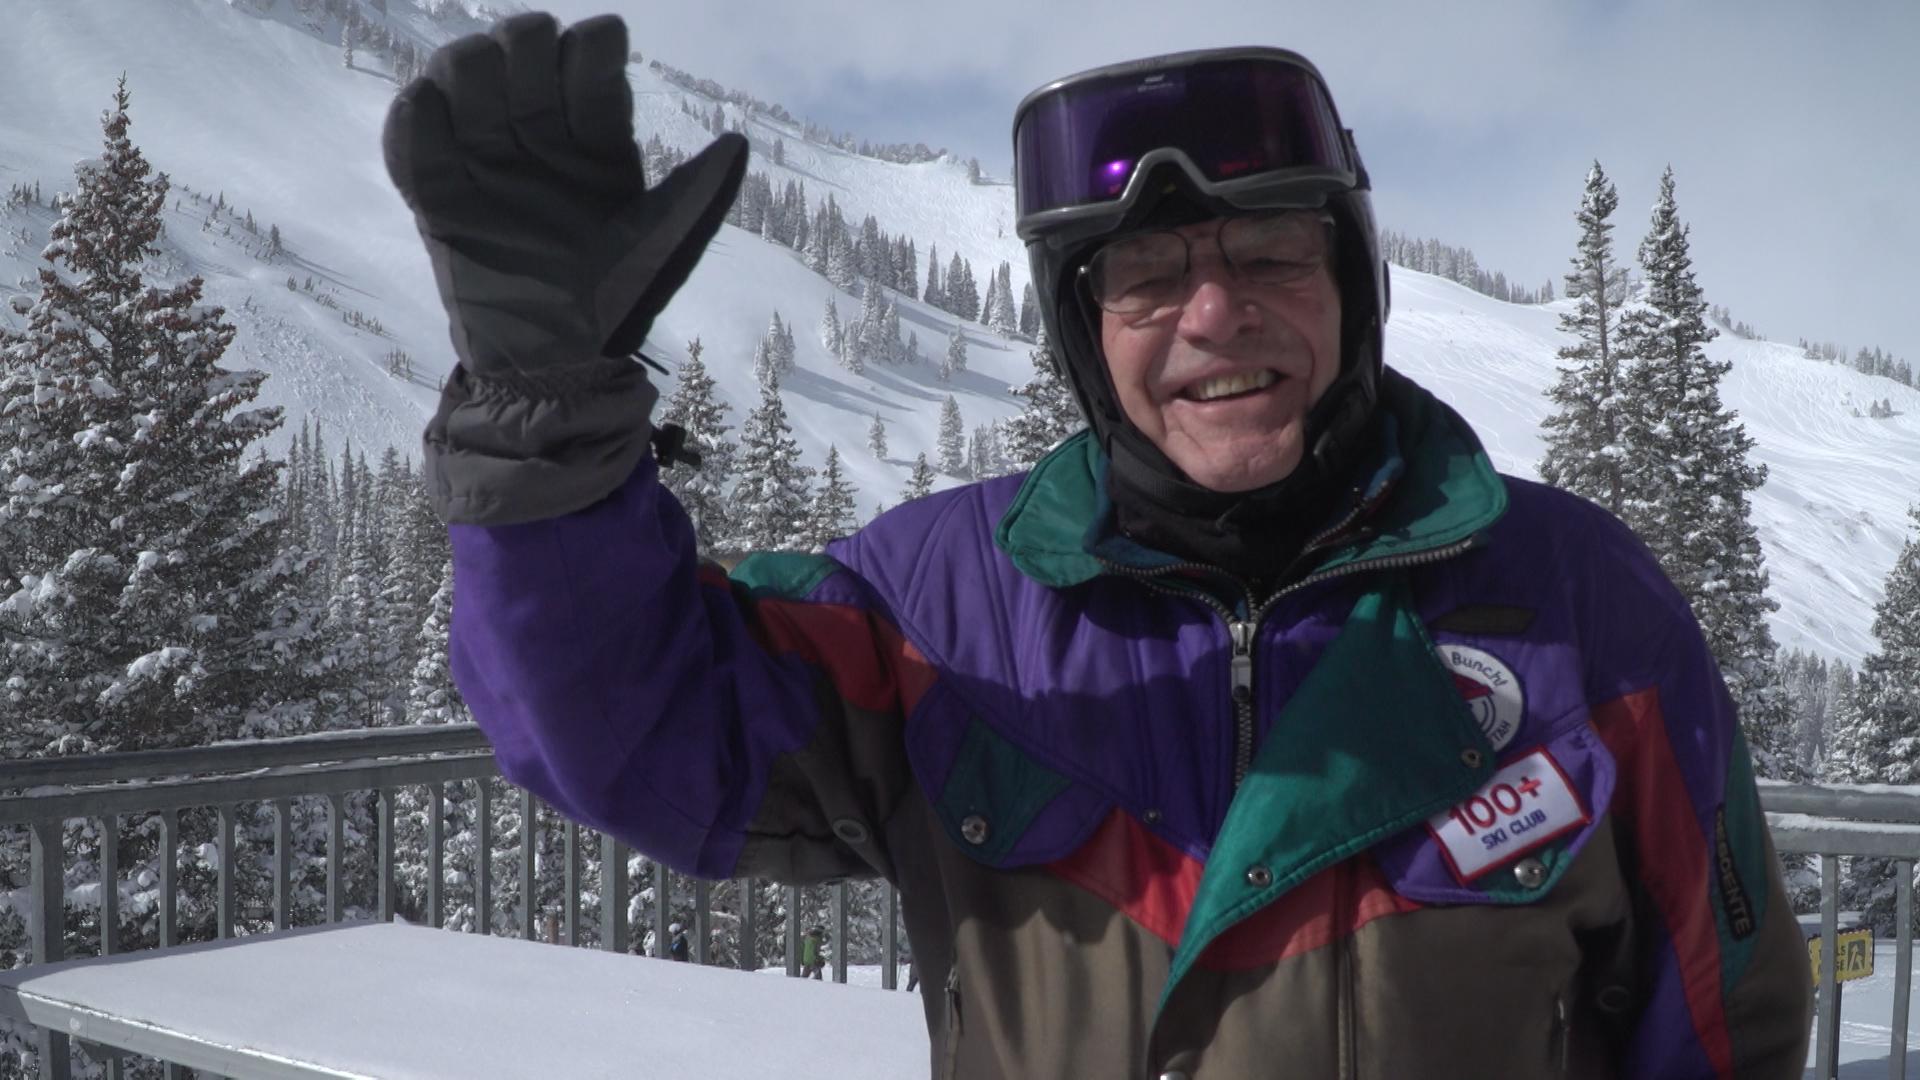 101 Year-Old Skier